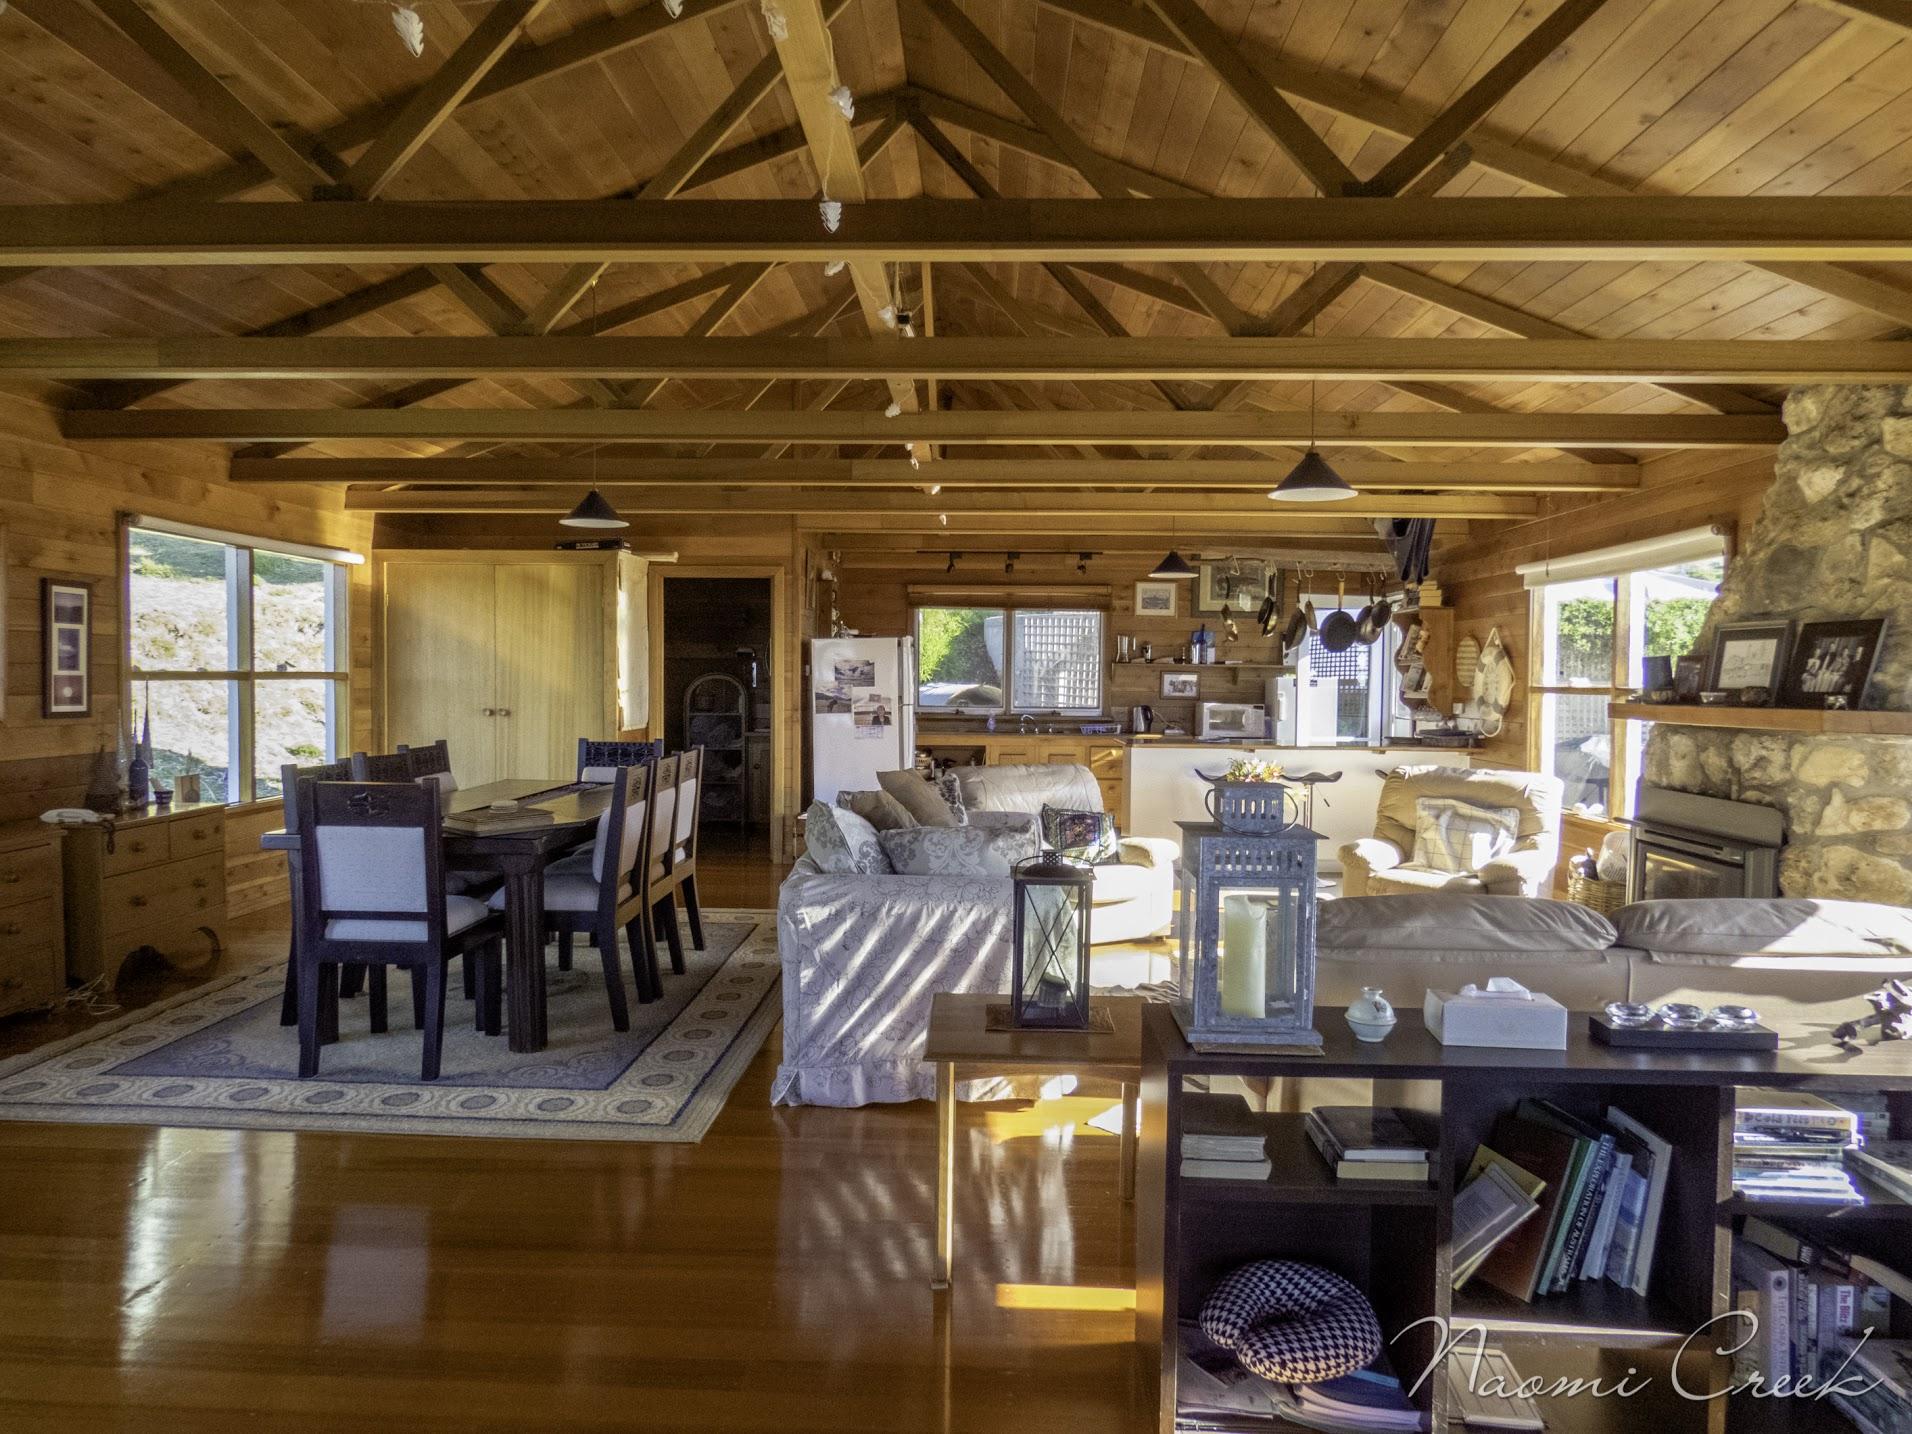 Open plan kitchen & living room area